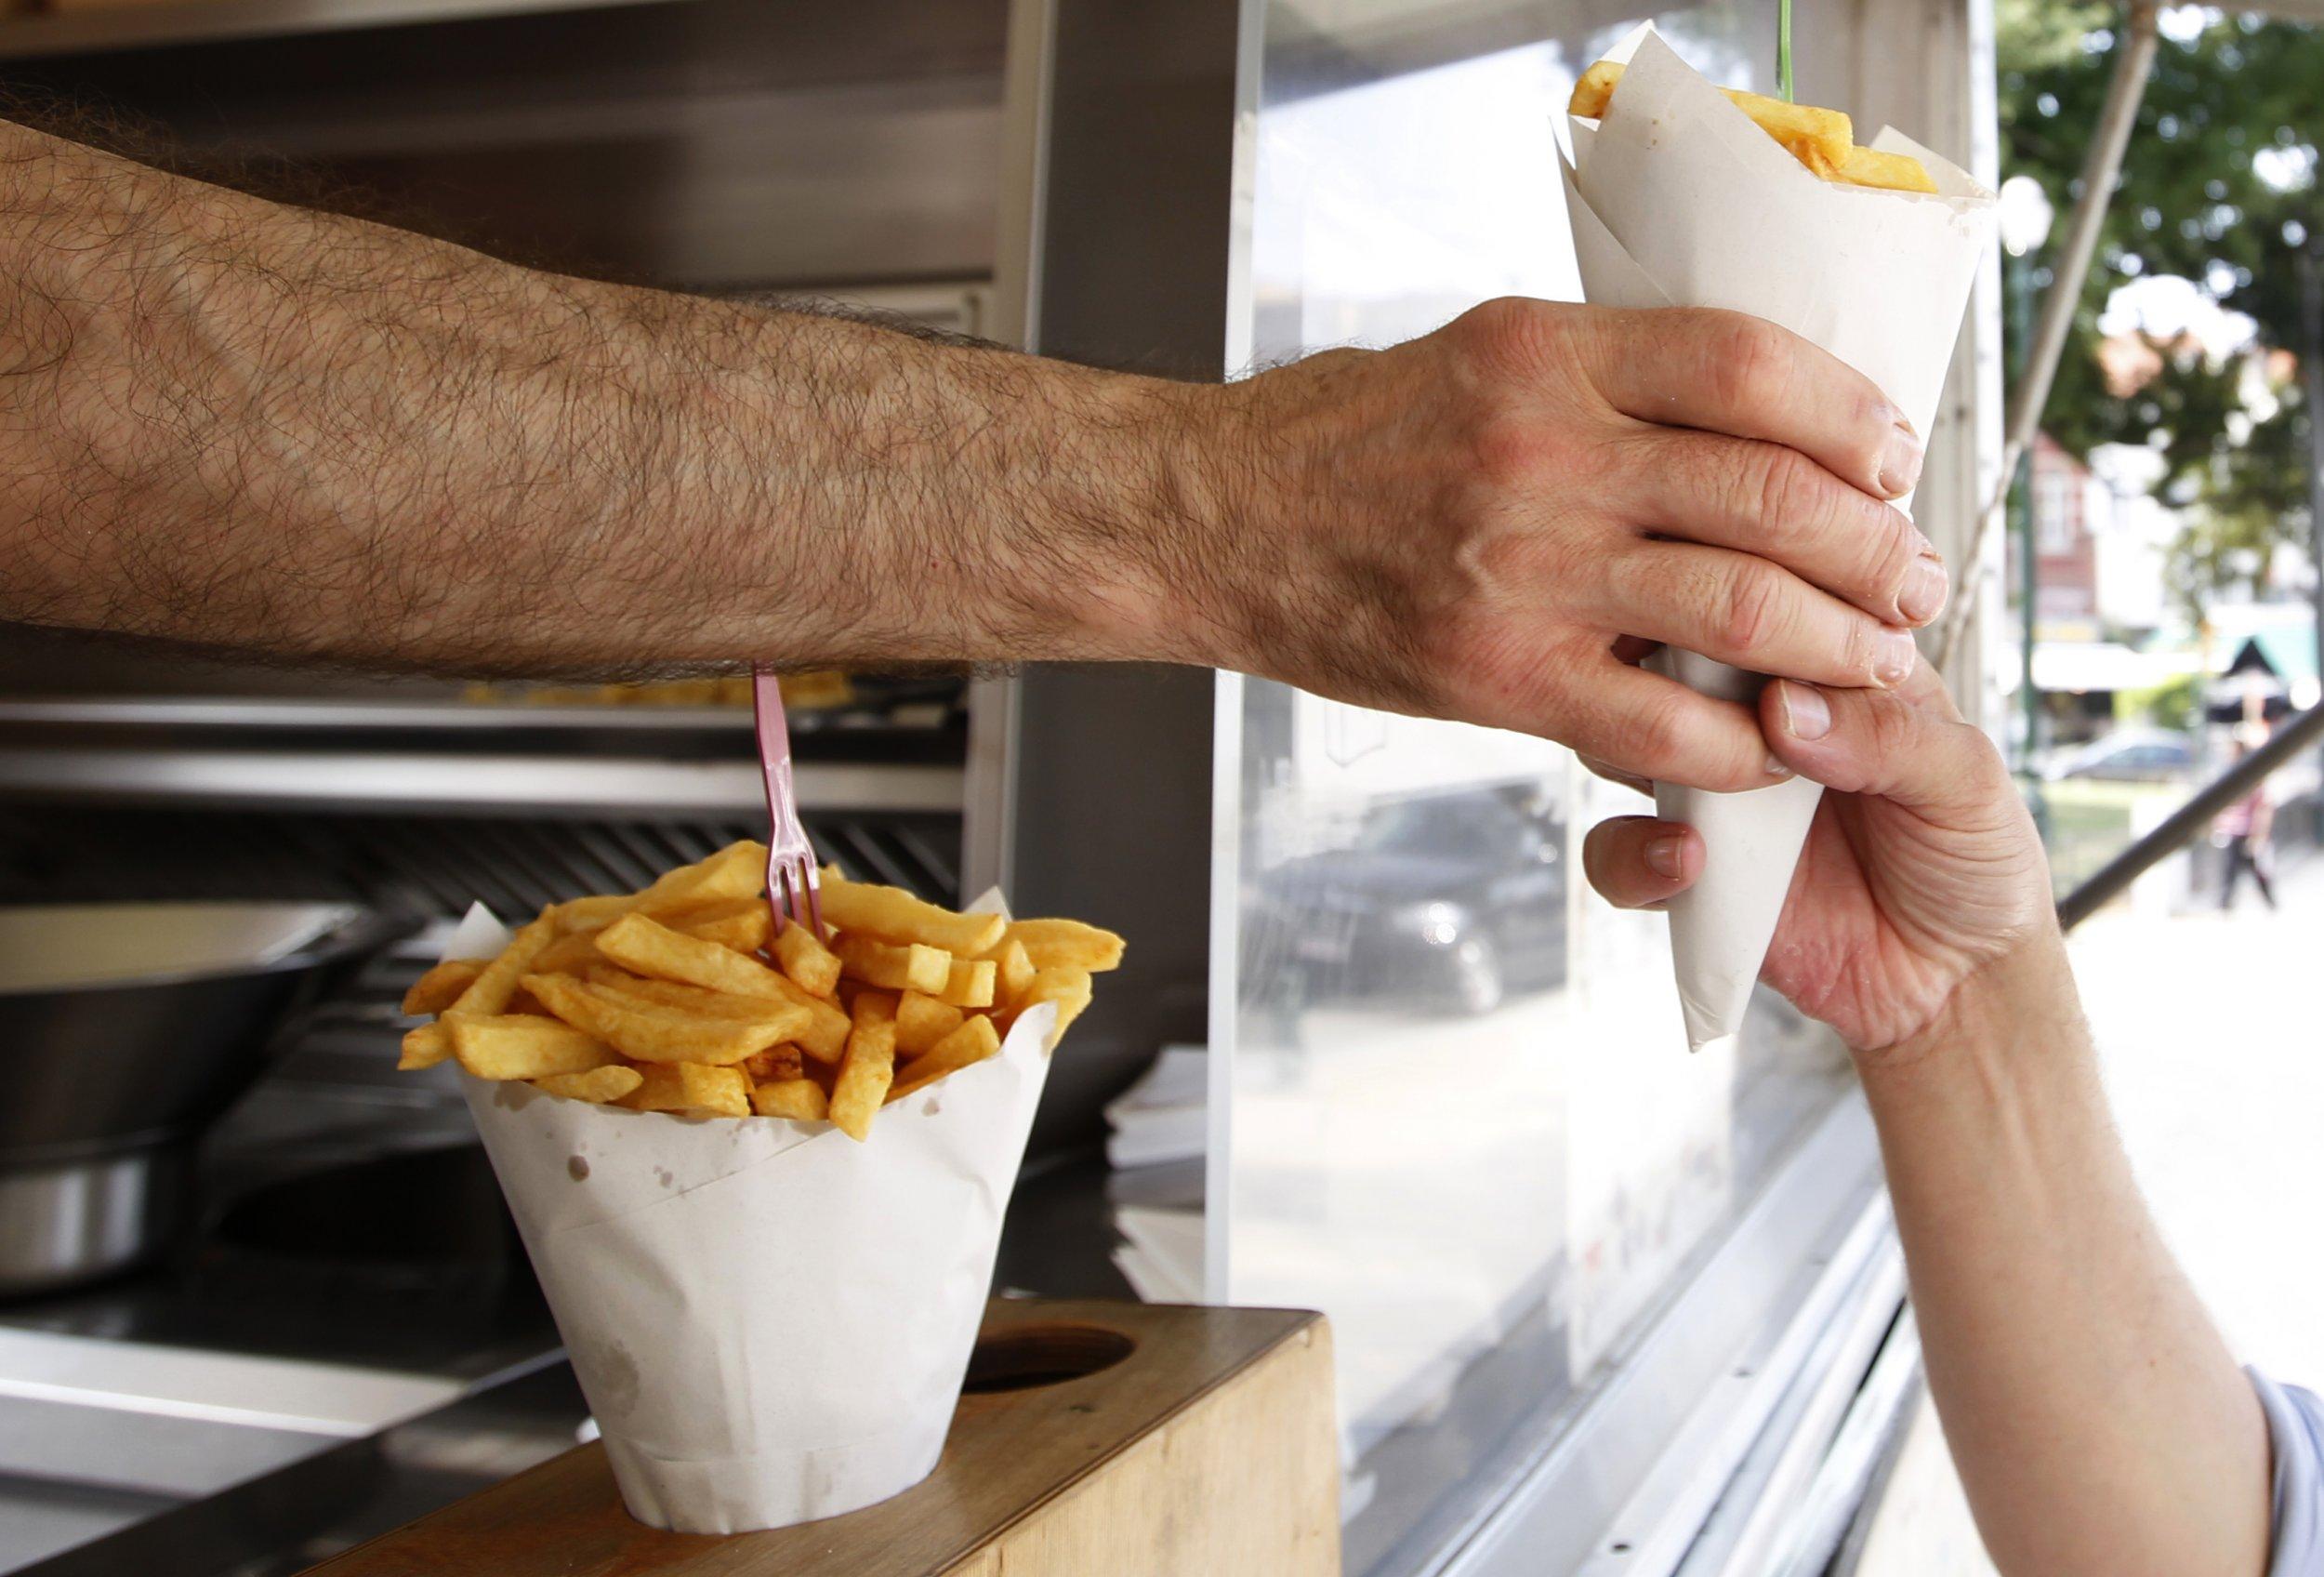 fries_trans fat